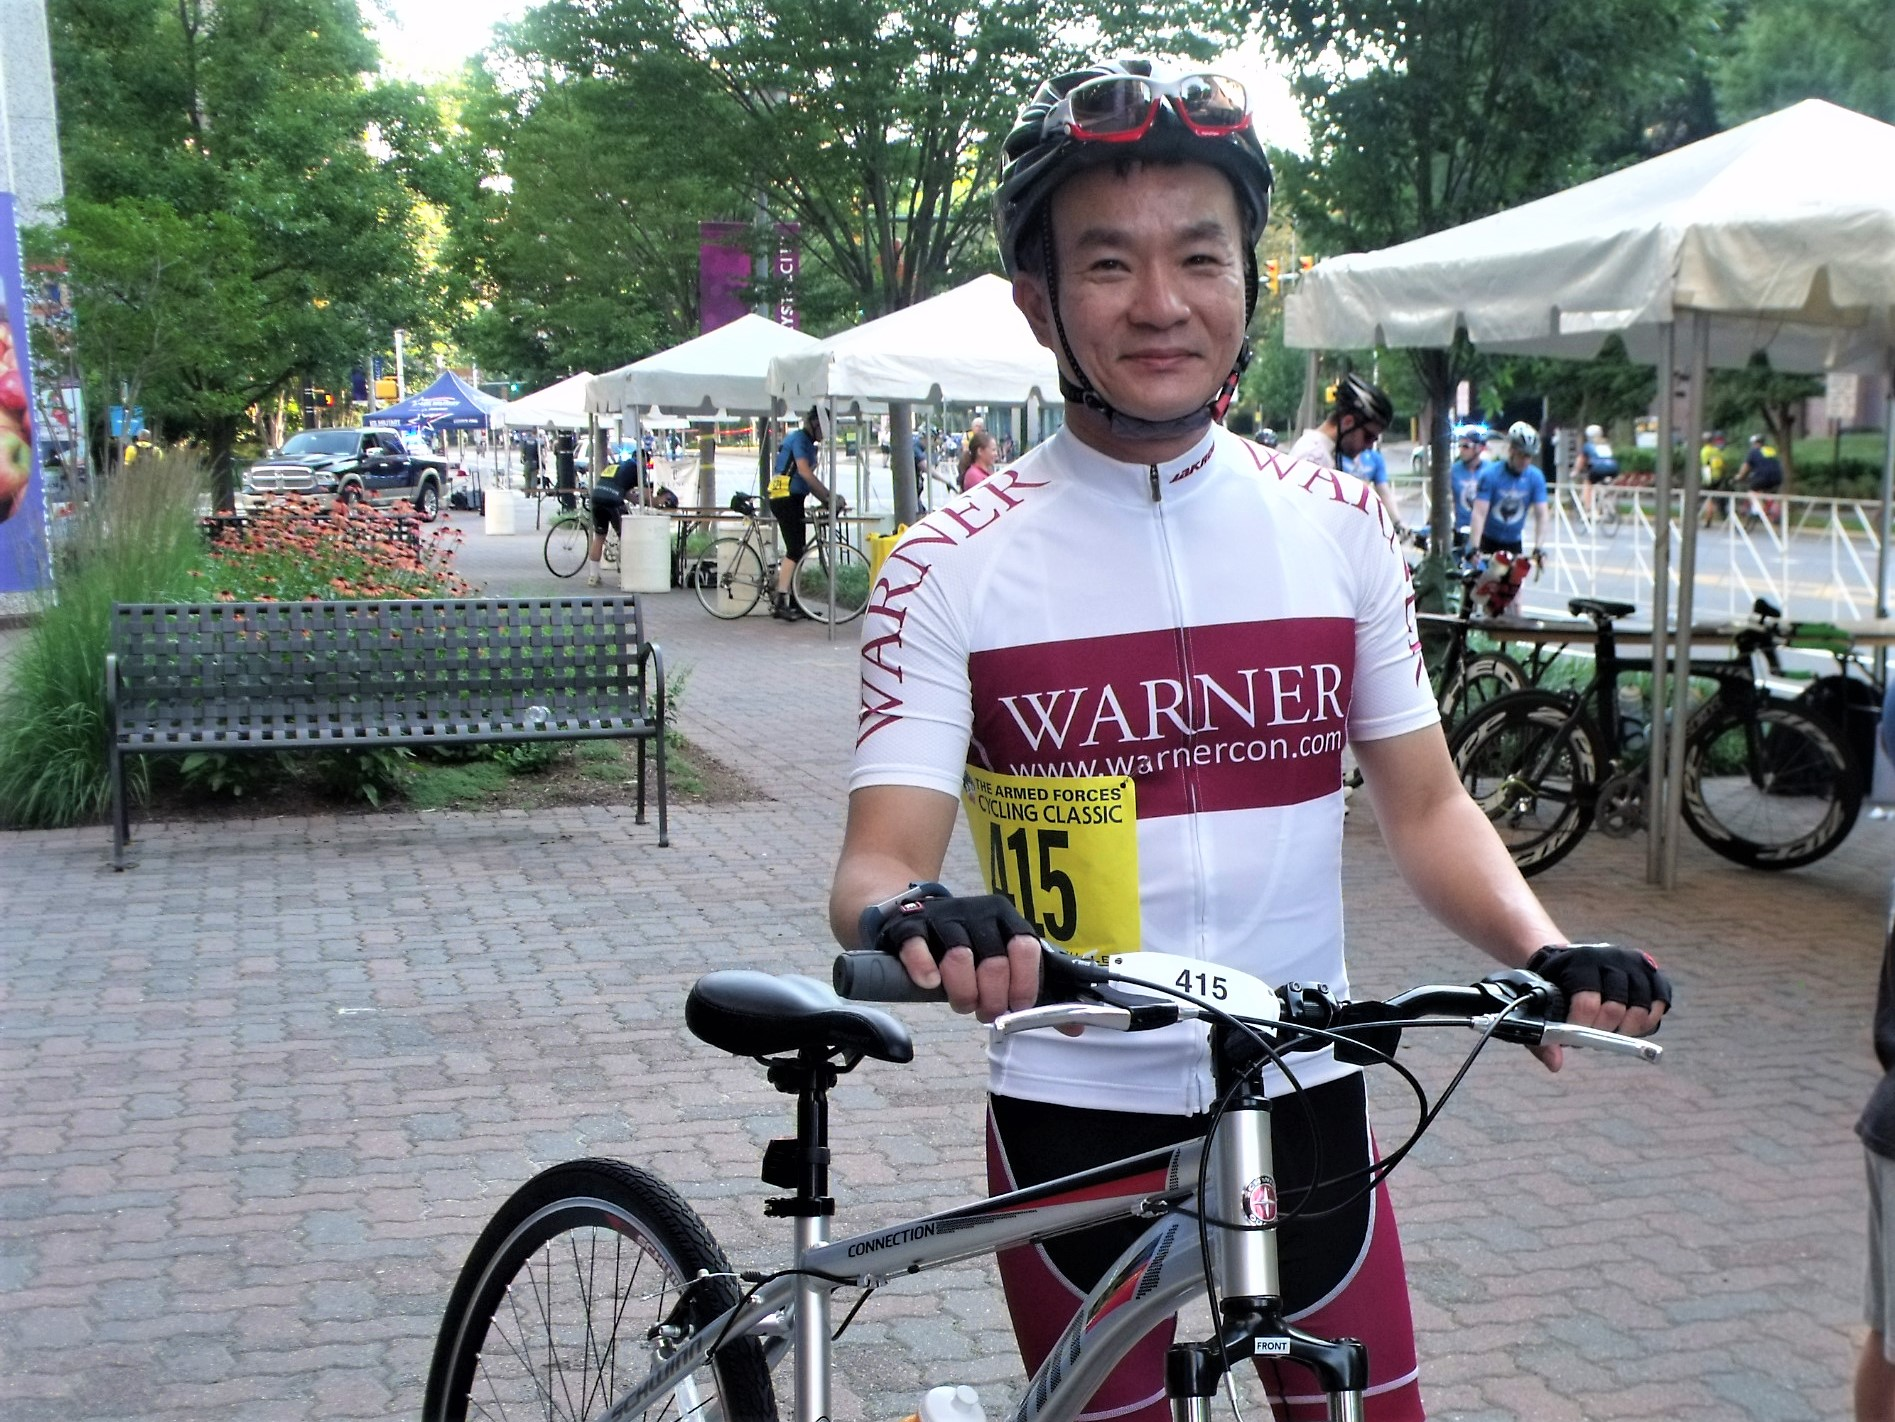 Warner 8.jpg